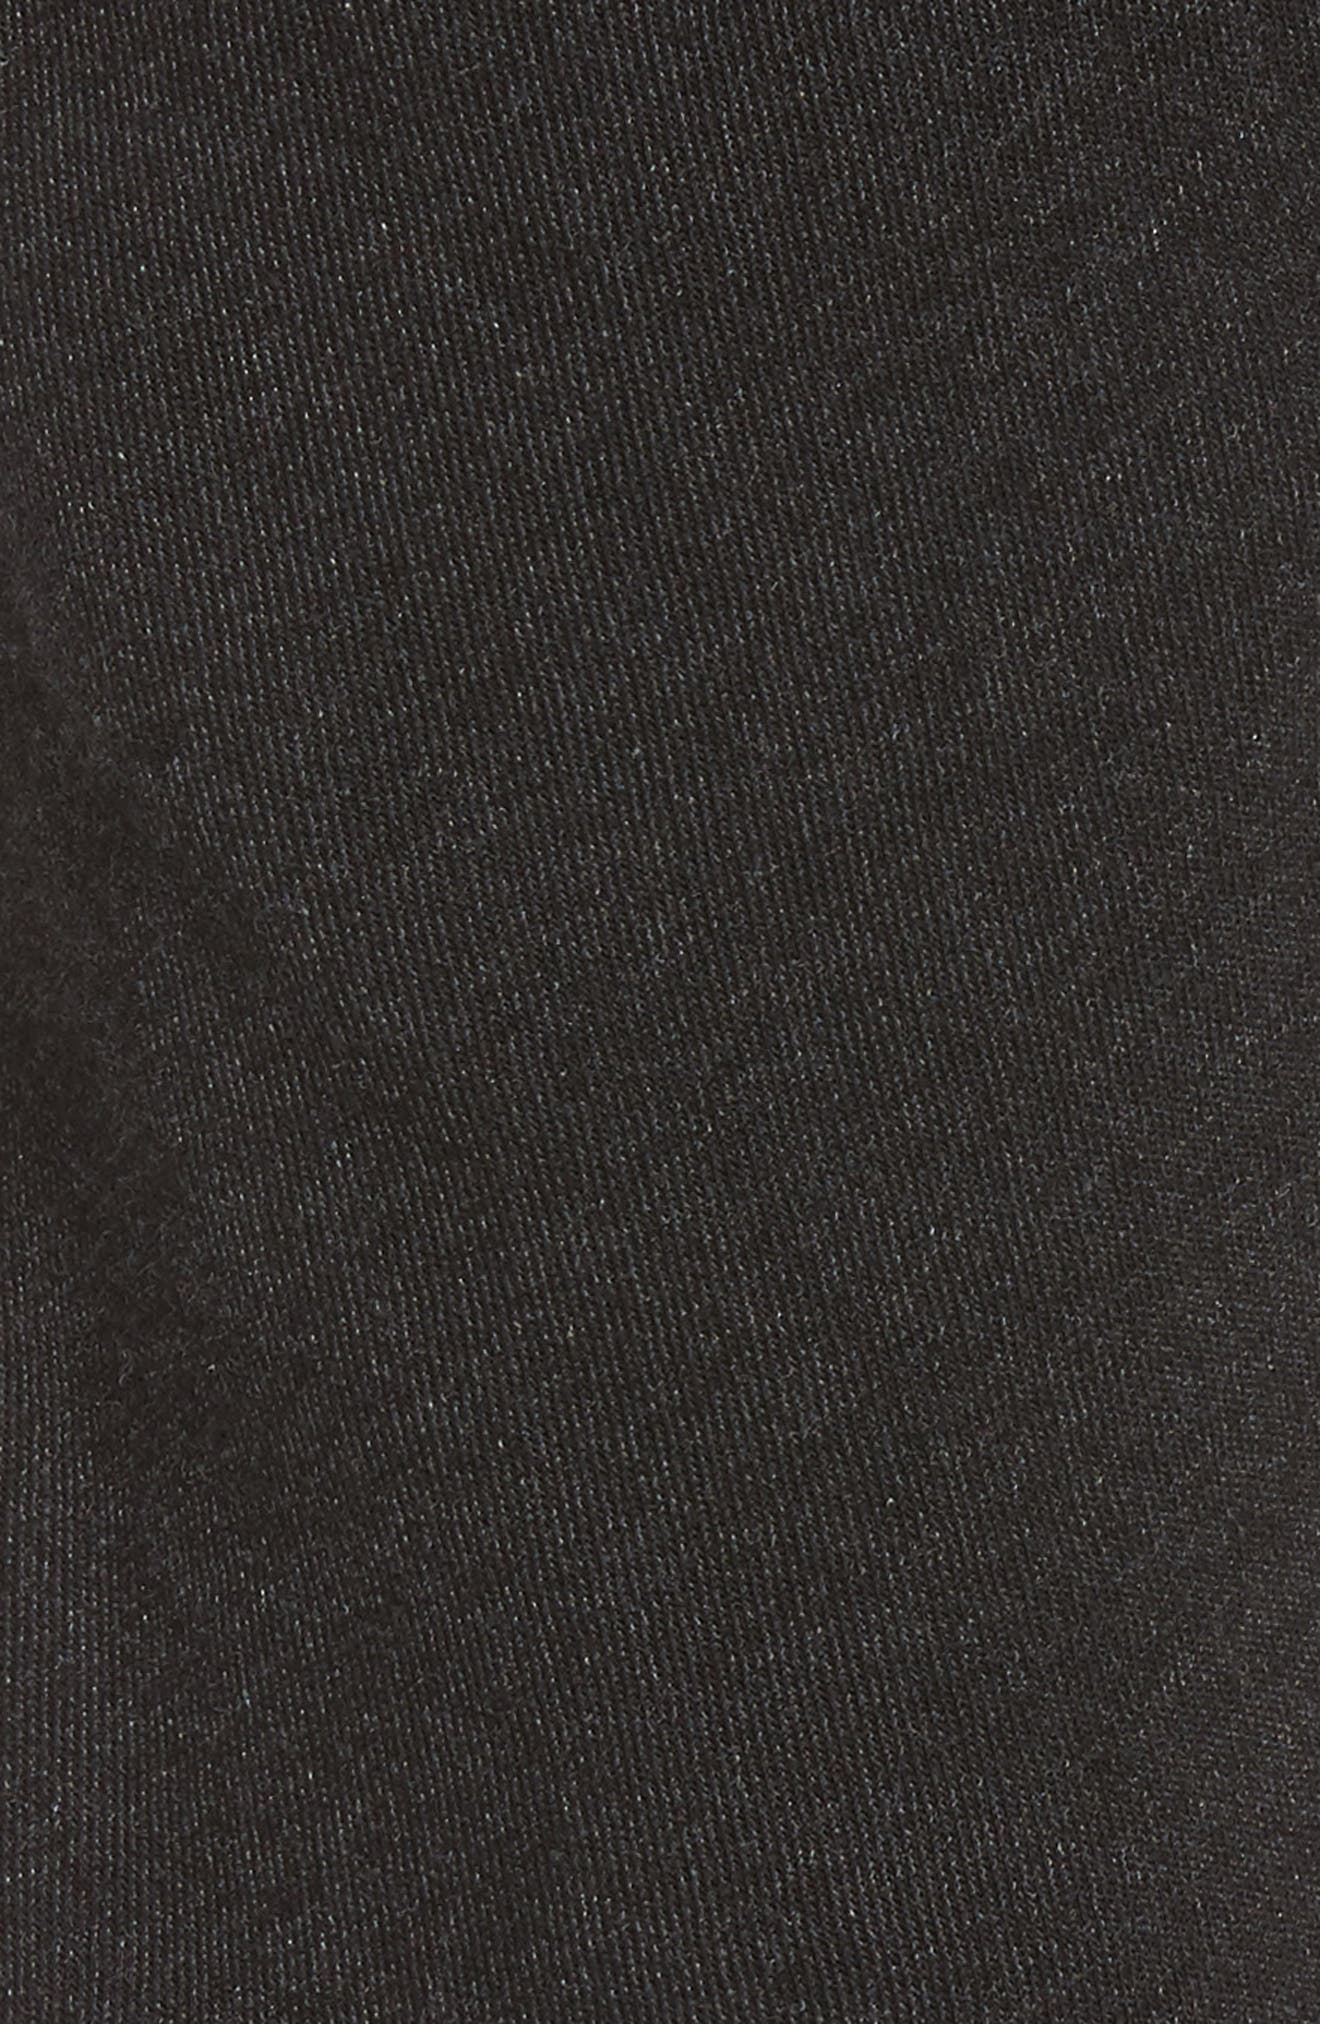 '80s Track Star Knox Sweatpants,                             Alternate thumbnail 5, color,                             001